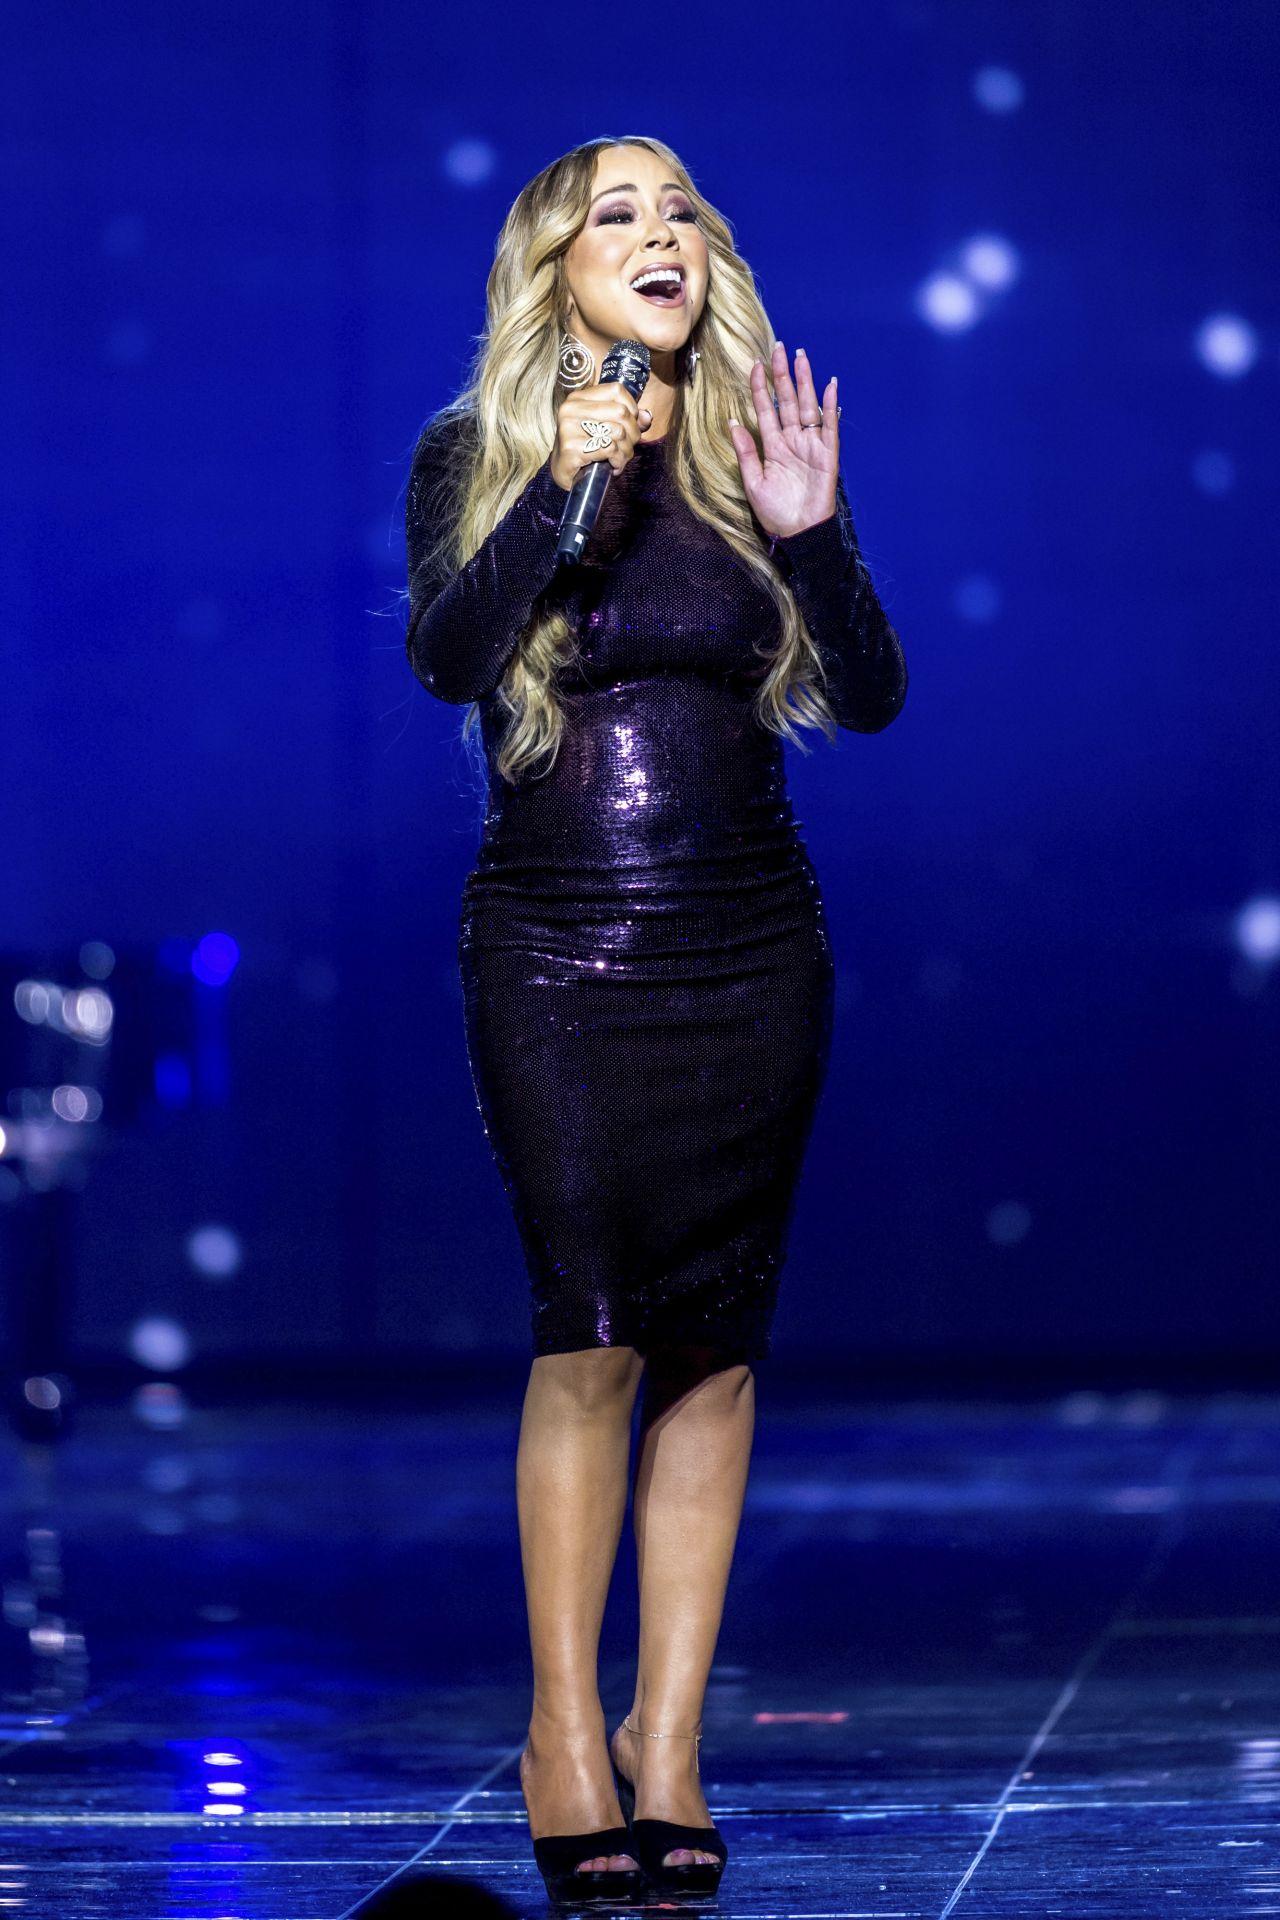 Mariah Carey - Tmall 11.11 Global Shopping Festival 2018